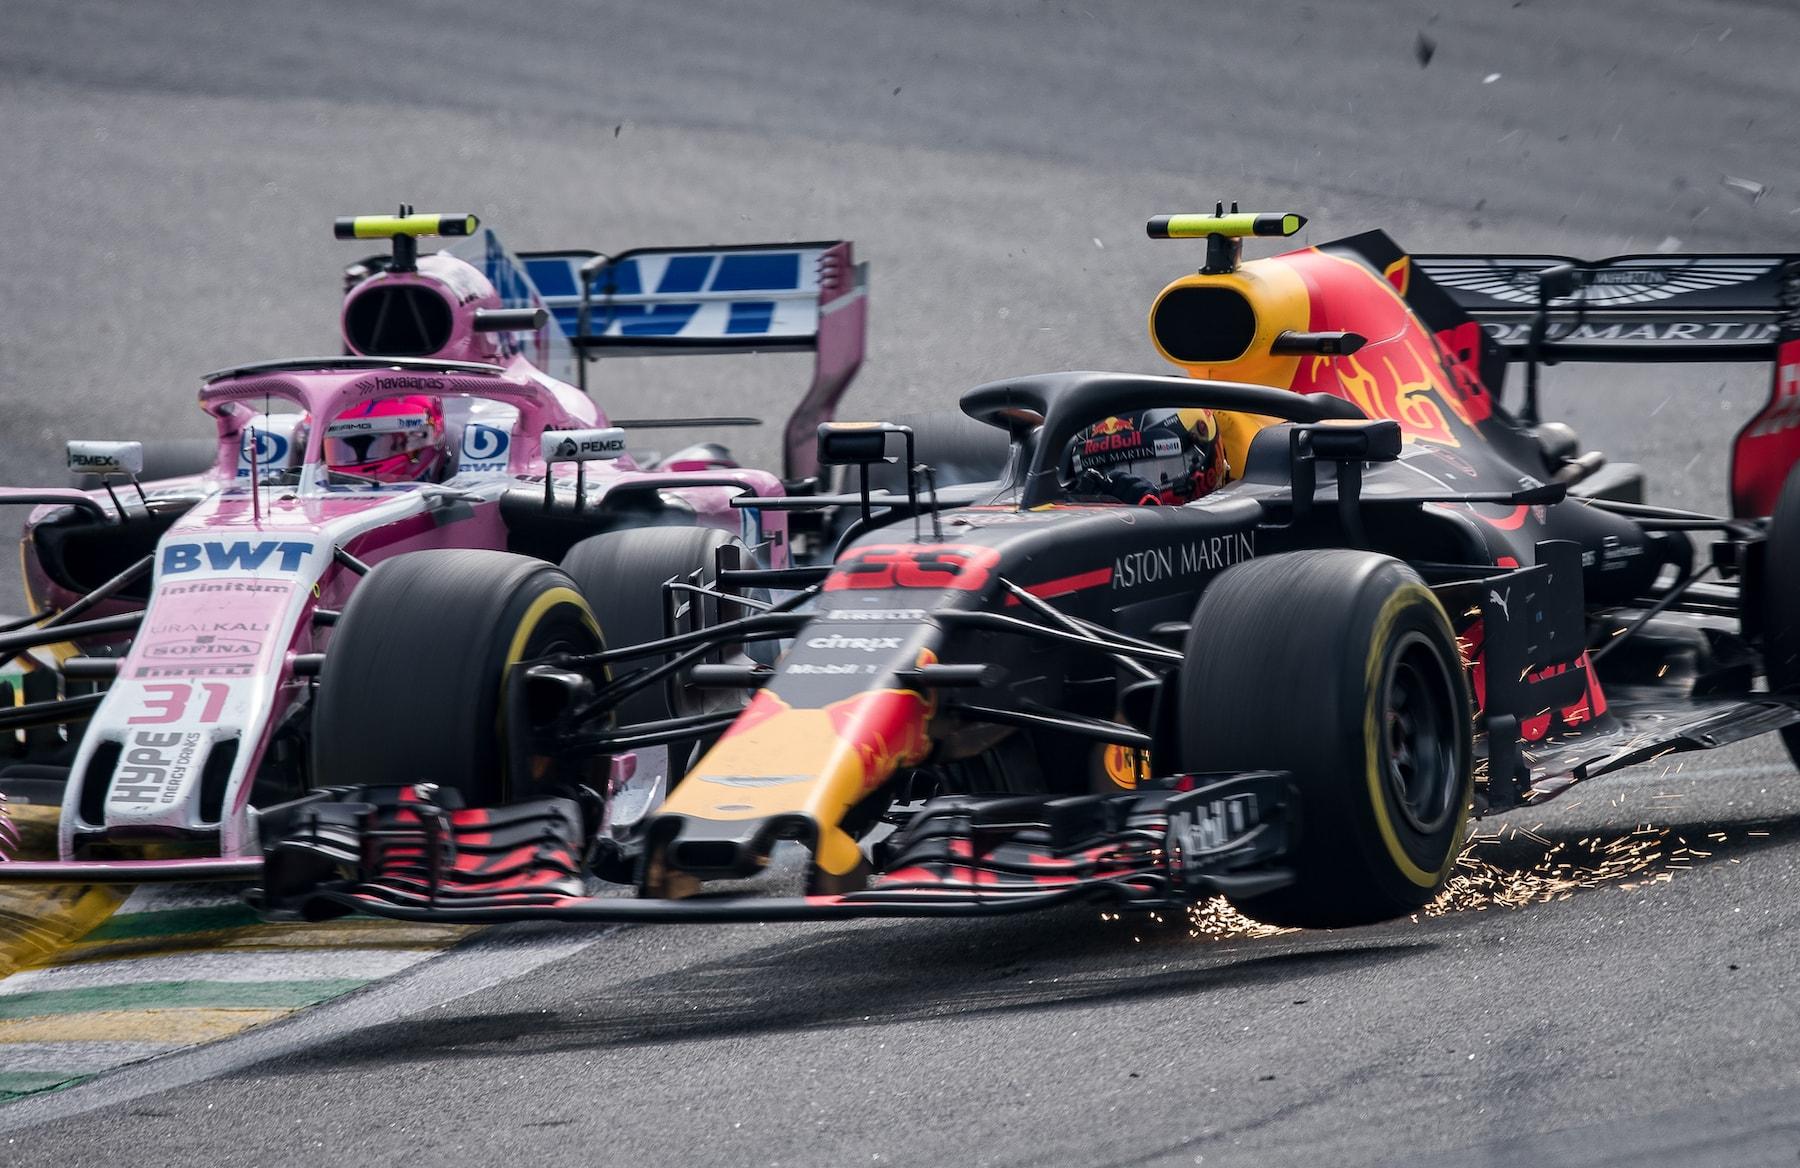 H 2018 Max Verstappen | Red Bull RB14 | 2018 Brazilian GP P2 1a copy.jpg